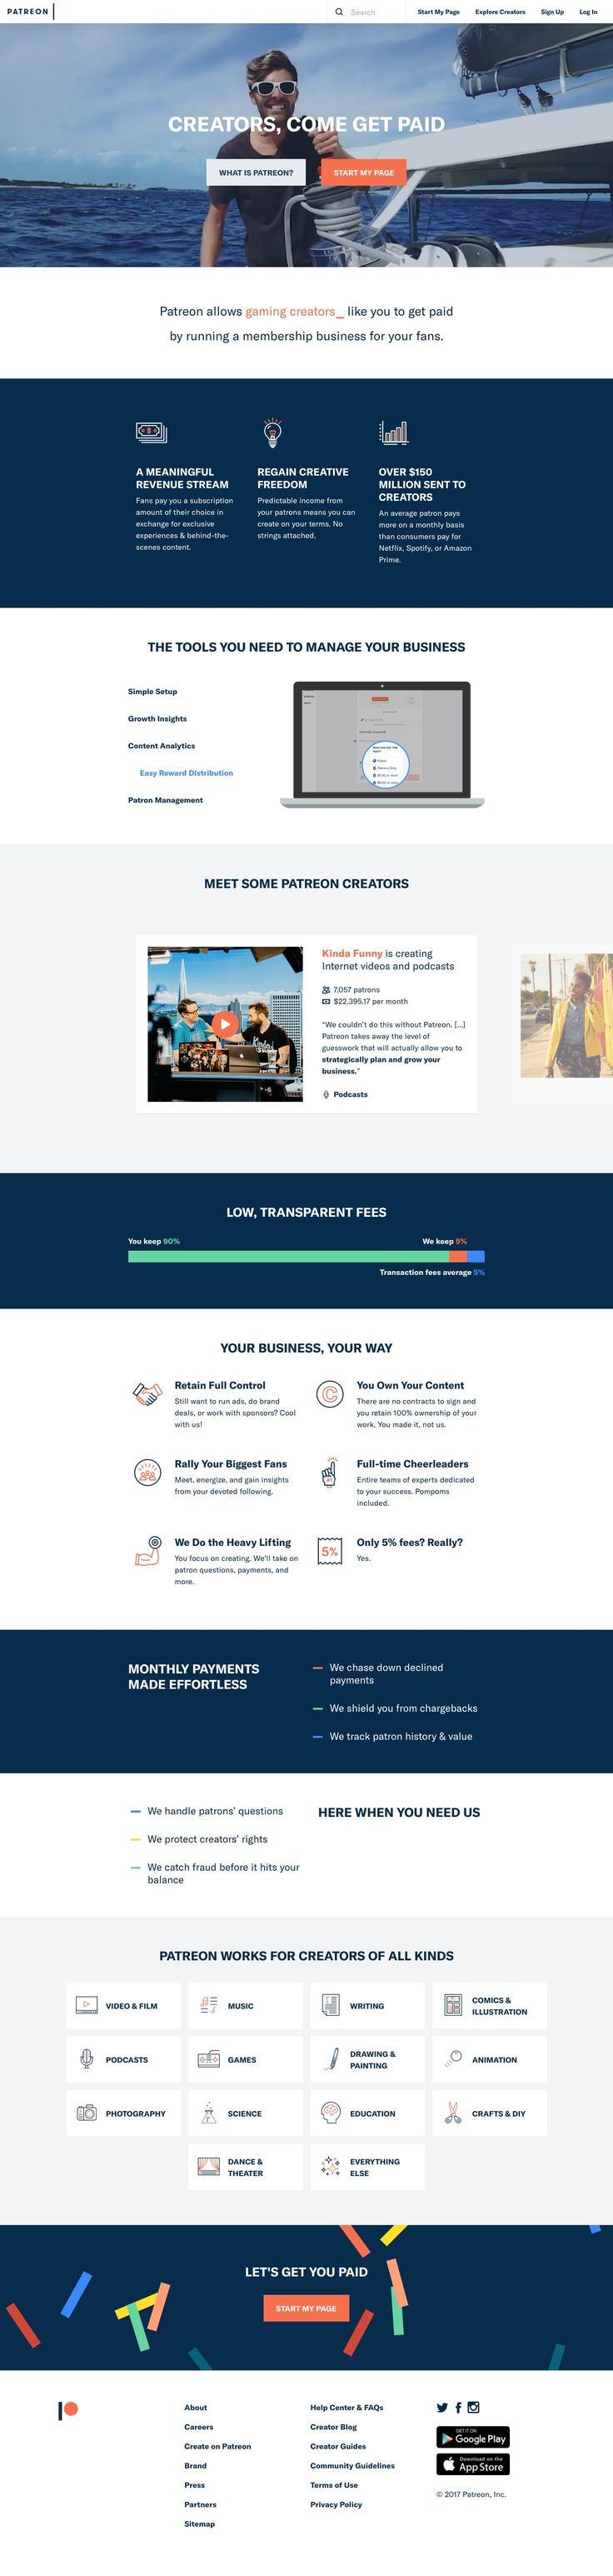 Patreon landing page design inspiration Best landing